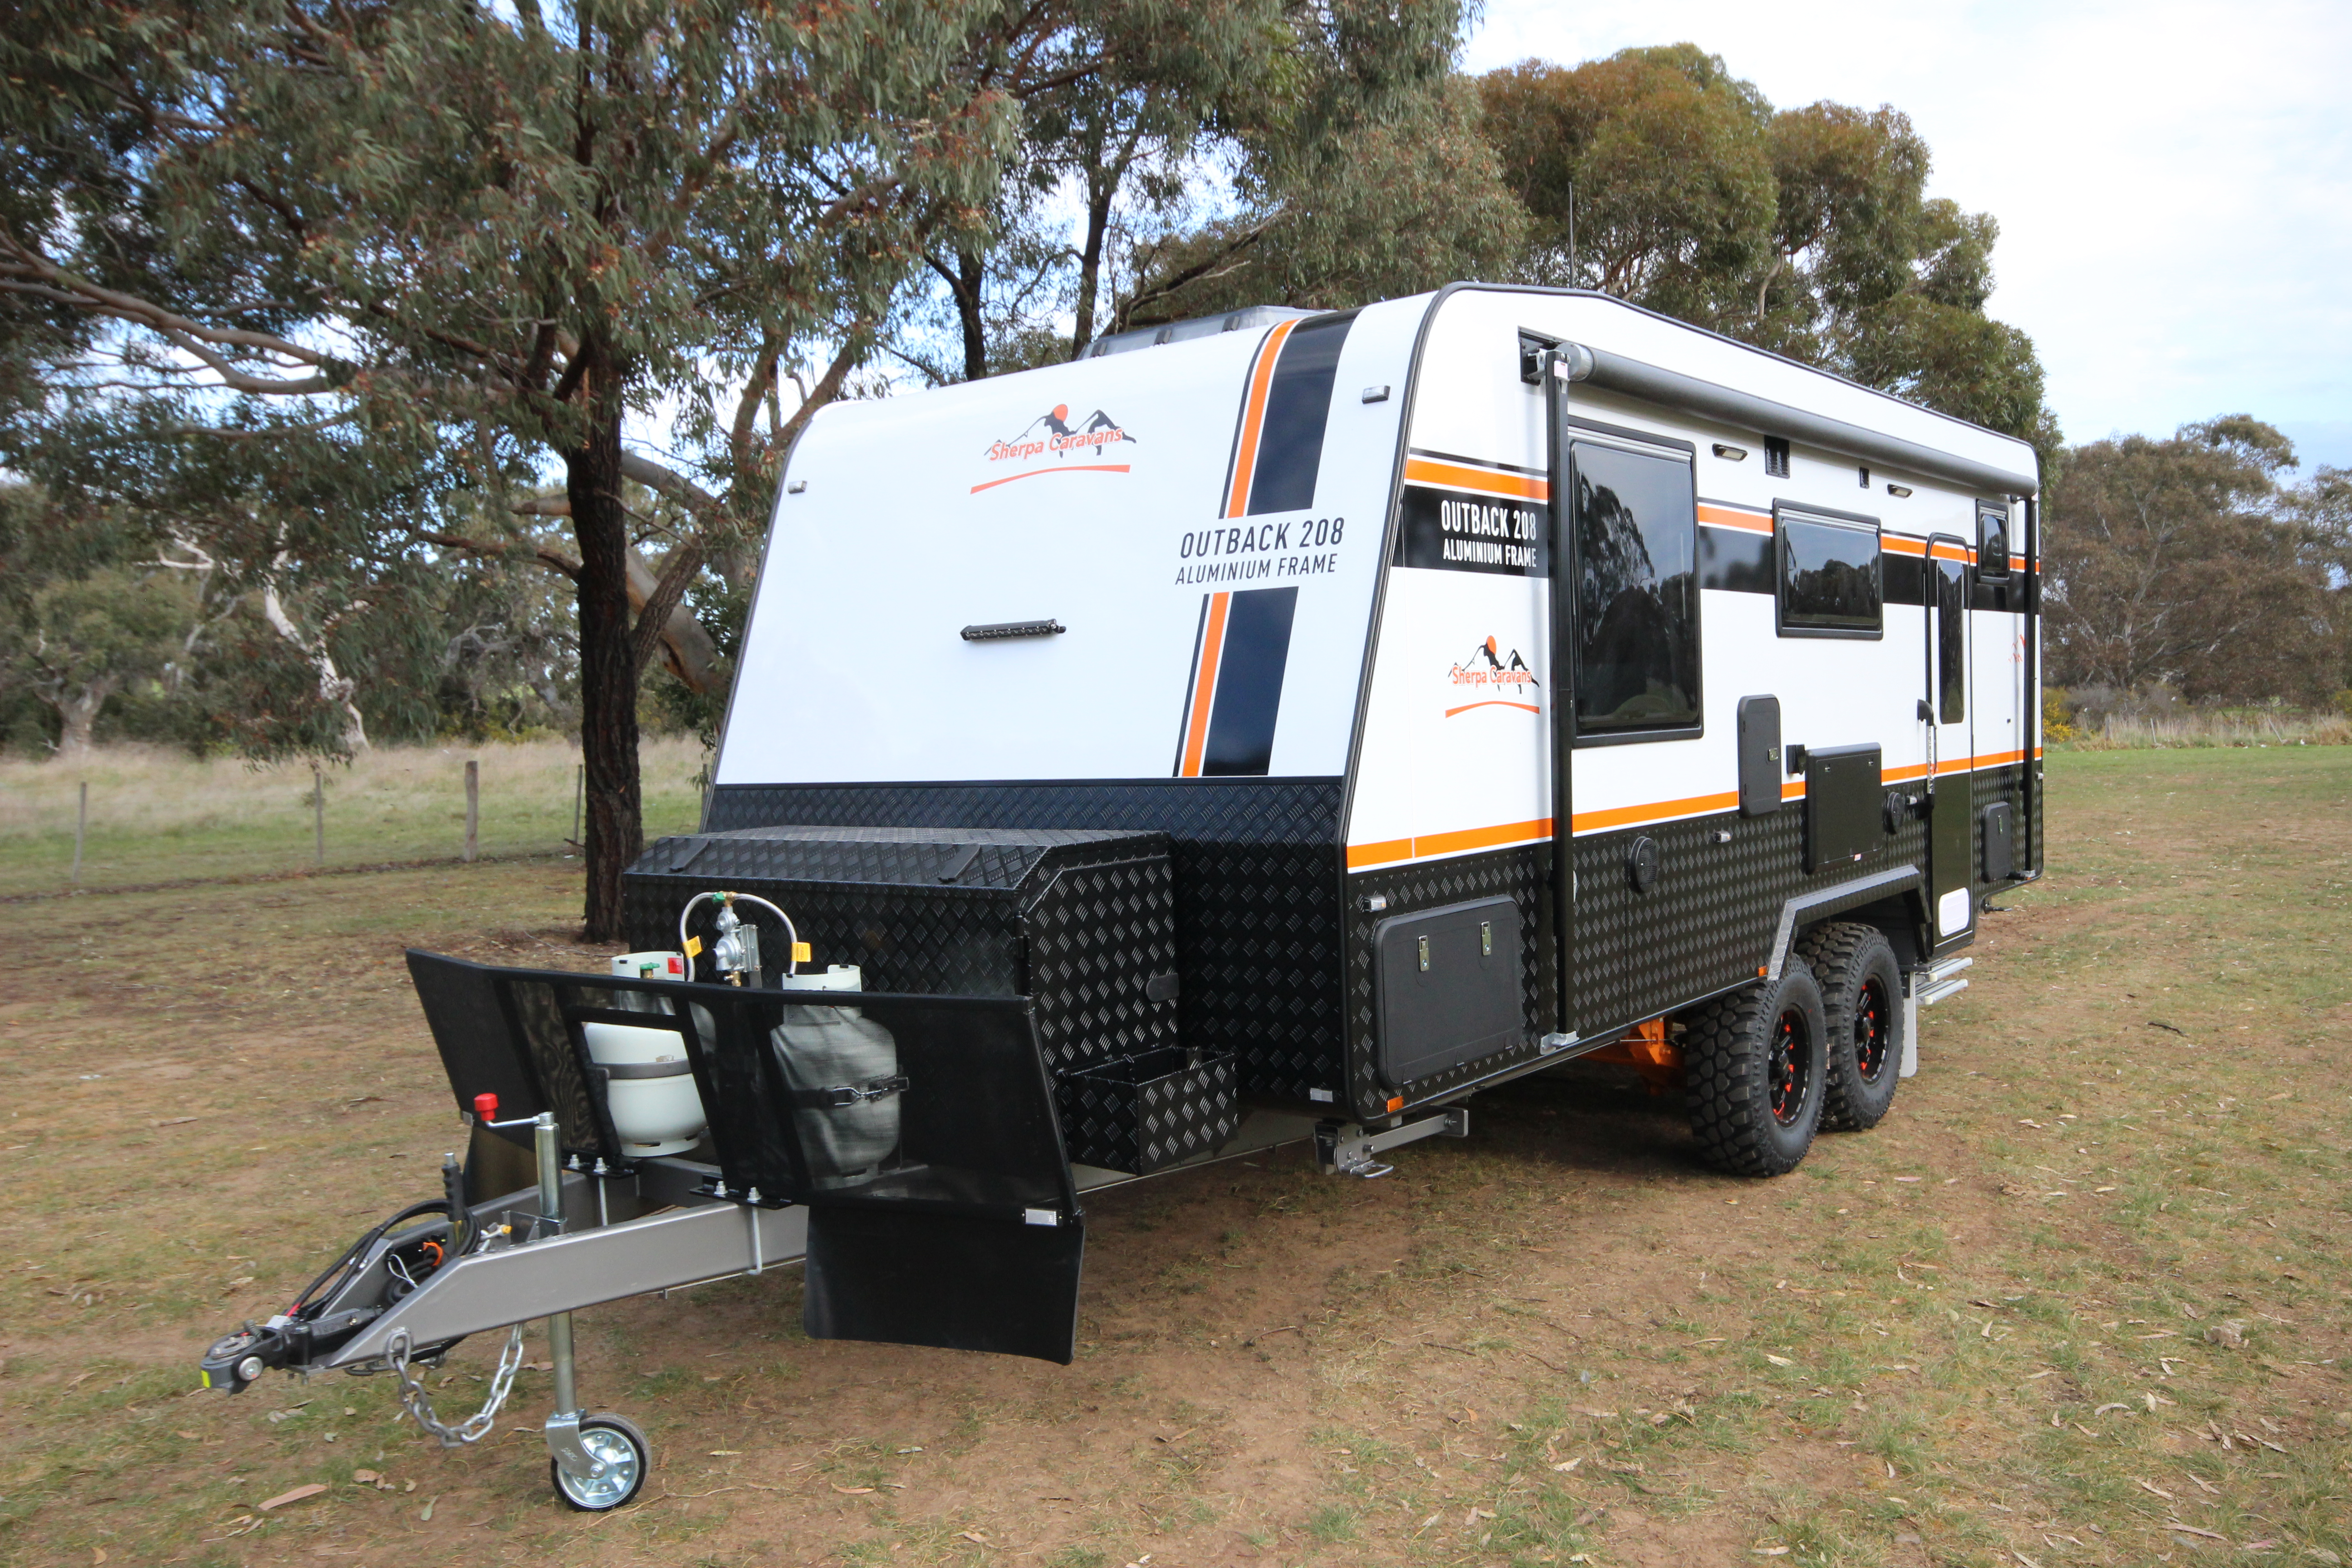 eden-caravans-outback-208-3jpg